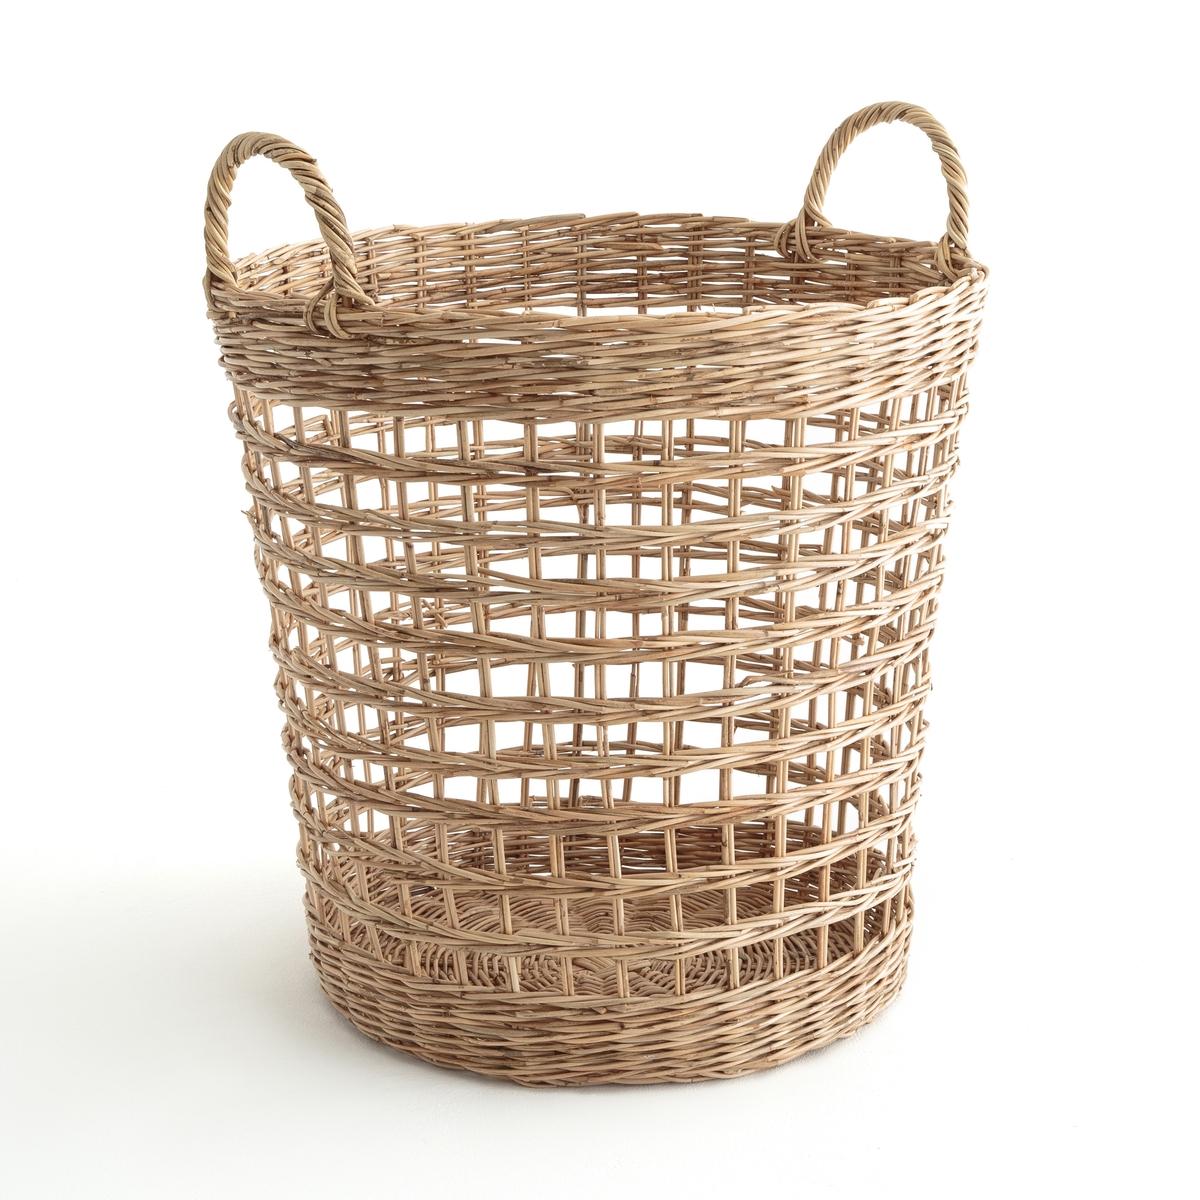 Корзина из ротанга, Rotino [супермаркет] иномат импорт jingdong офиса хранение корзины кухня хранение корзина отделка корзина корзина хранения pink